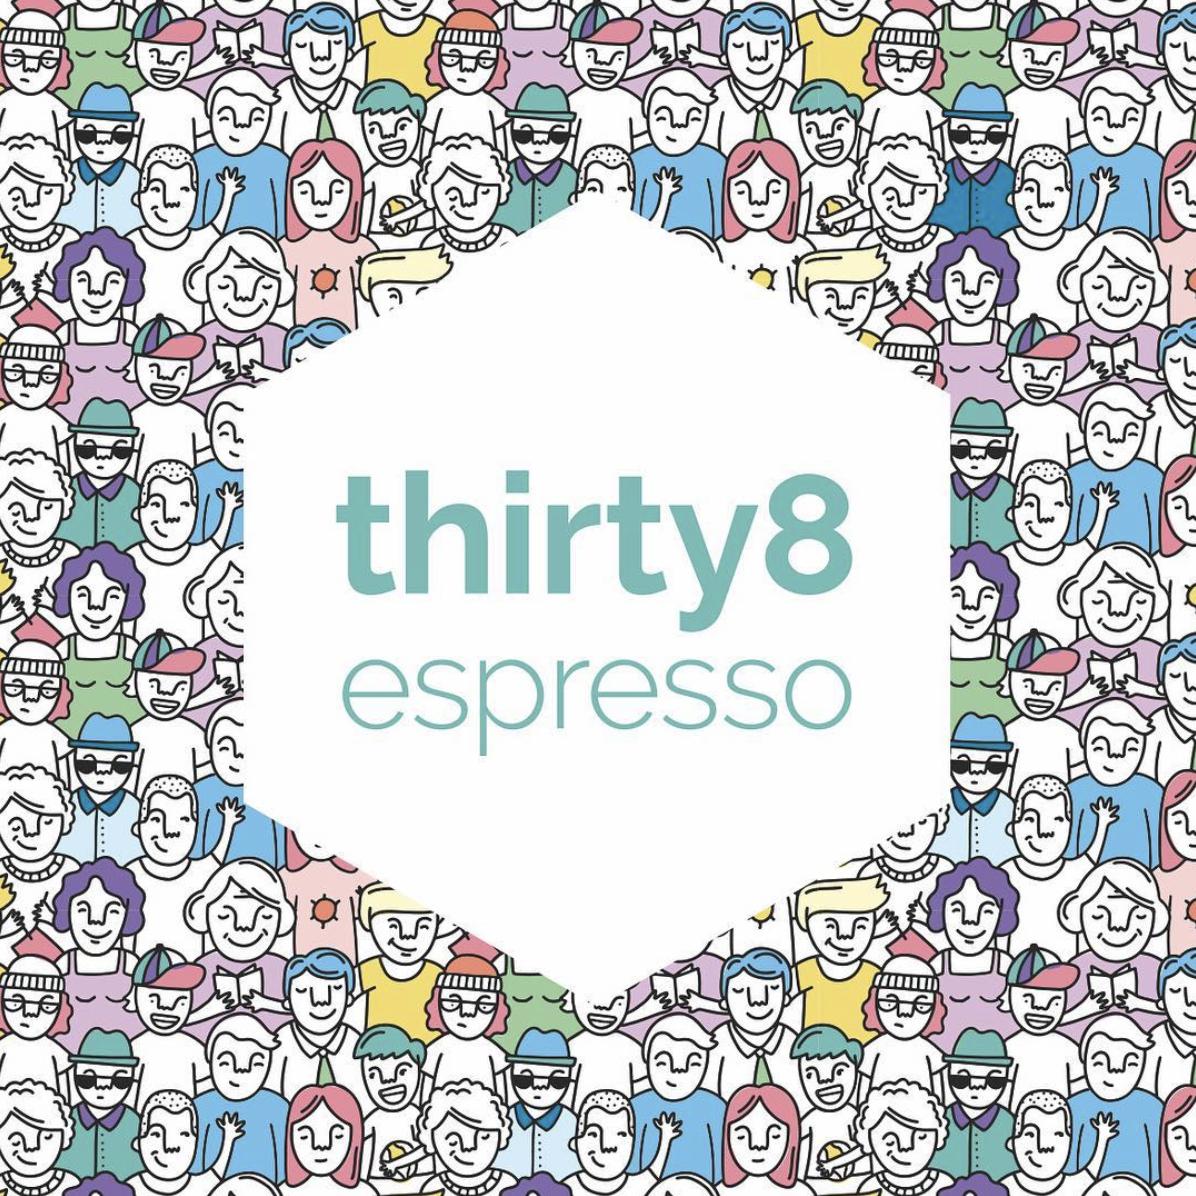 38 Espresso - Logo refreshSeasonal menusSocial mediaPosters